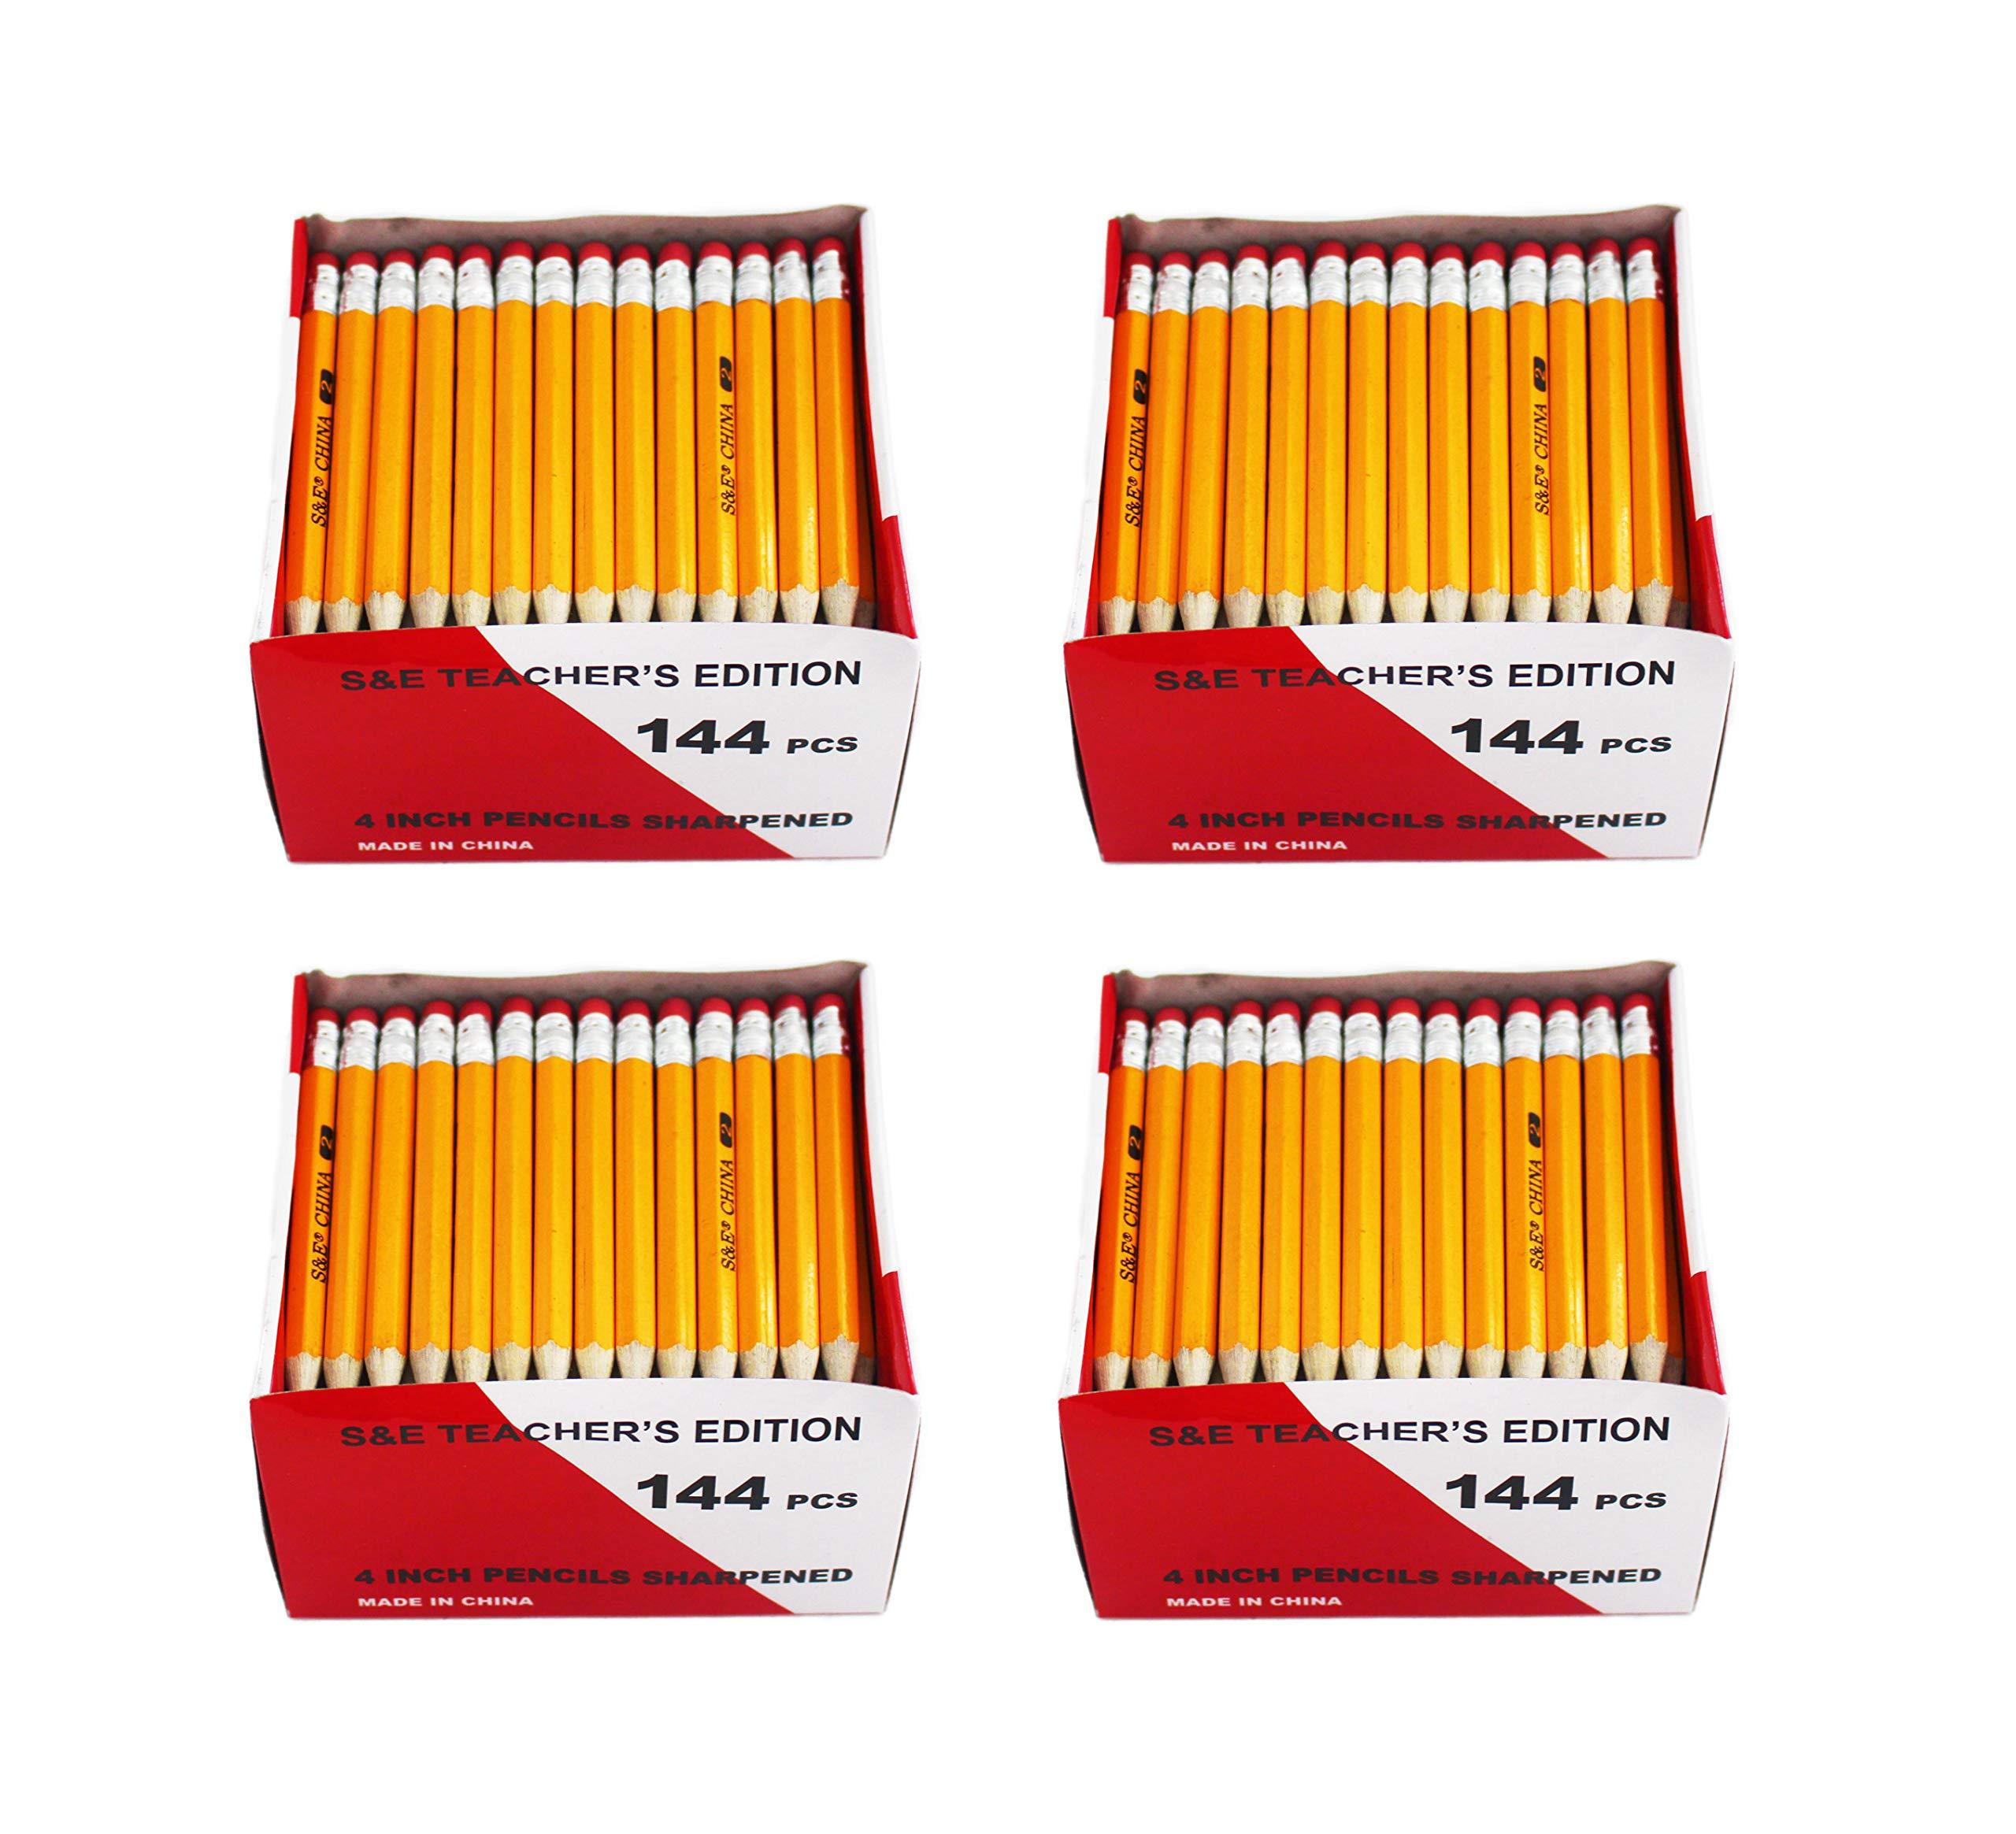 S & E TEACHER'S EDITION Half Pencils with Eraser Tops 576Pcs, Golf, Classroom, Pew - #2 HB, Hexagon, 144/Box.(pack of 4) by S & E TEACHER'S EDITION